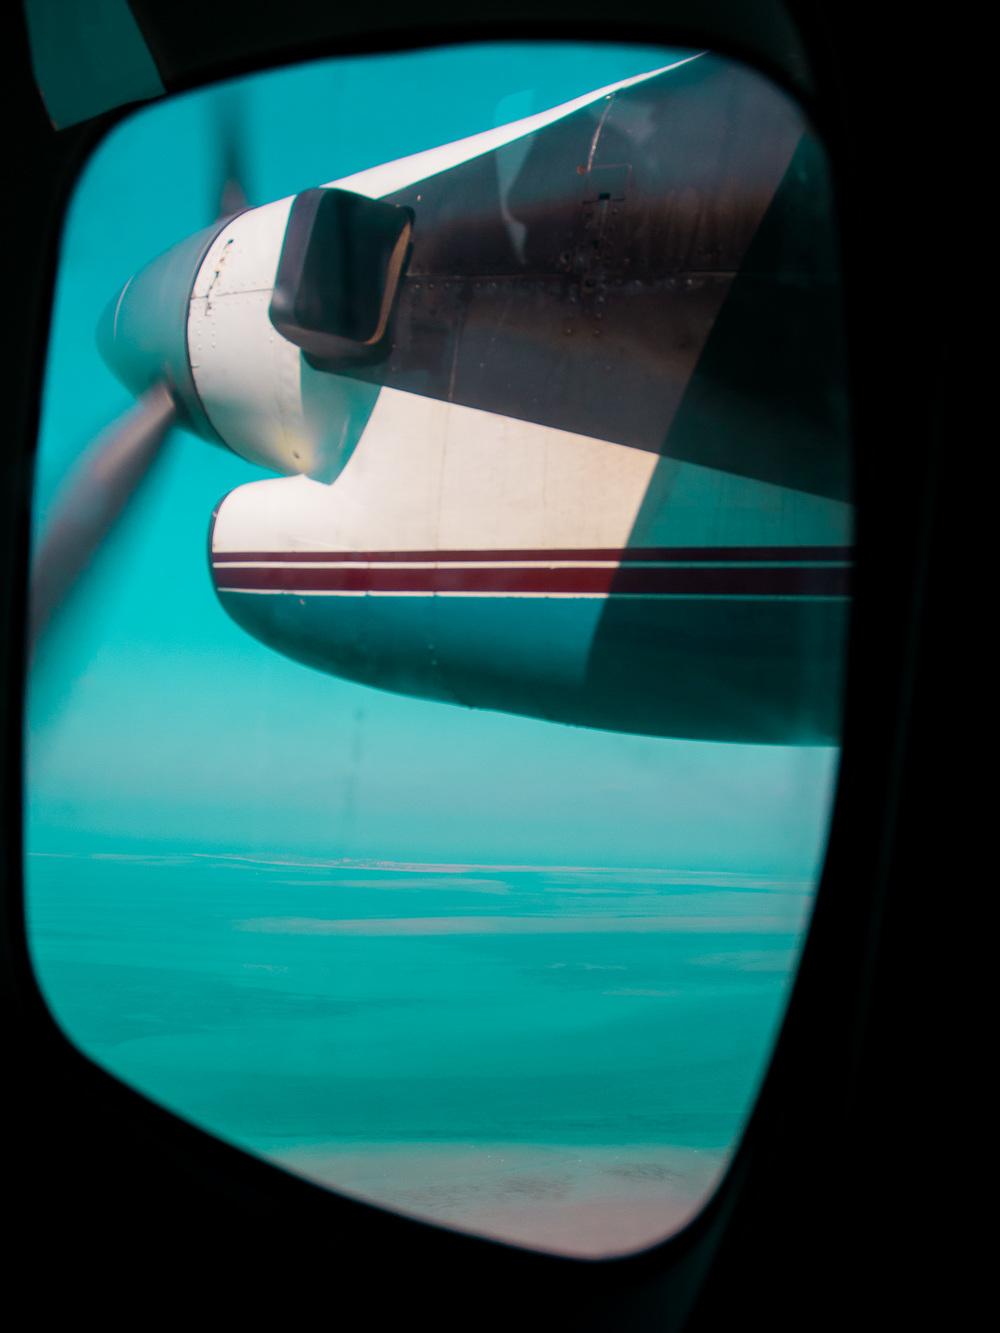 Nick_Aldridge_Travel-1632.jpg